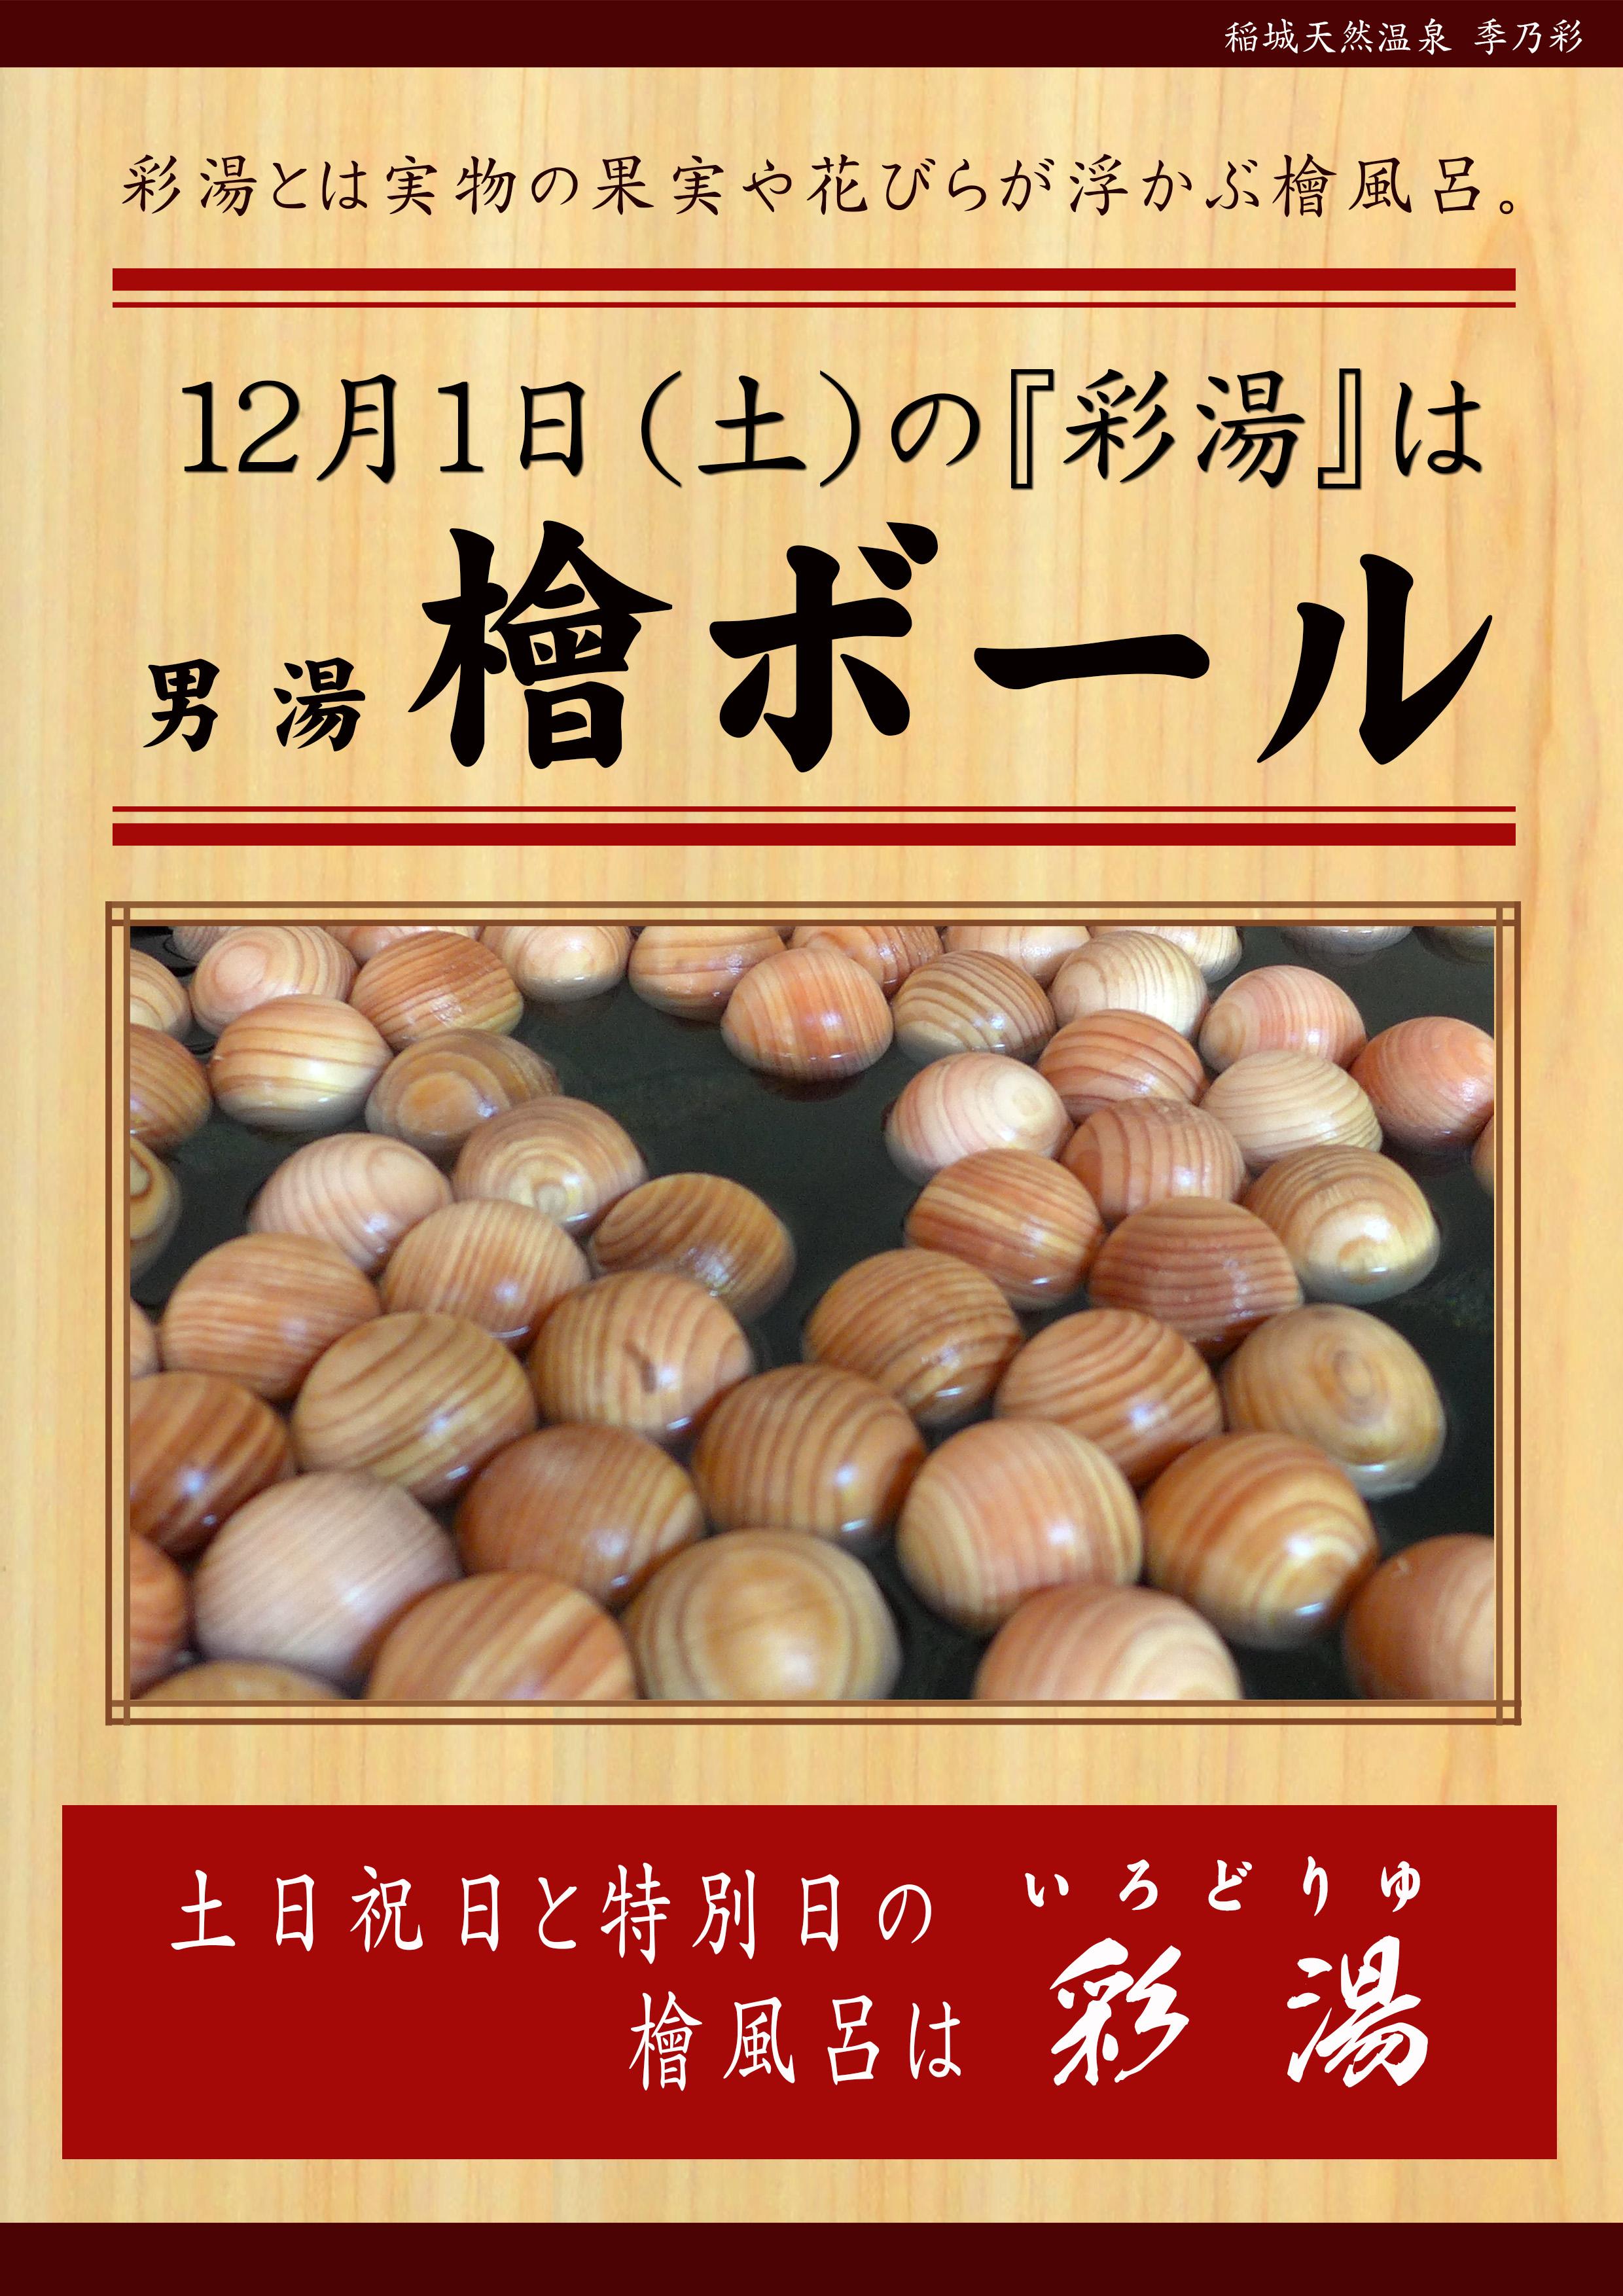 20181201POP イベント 彩湯 男湯 檜ボール